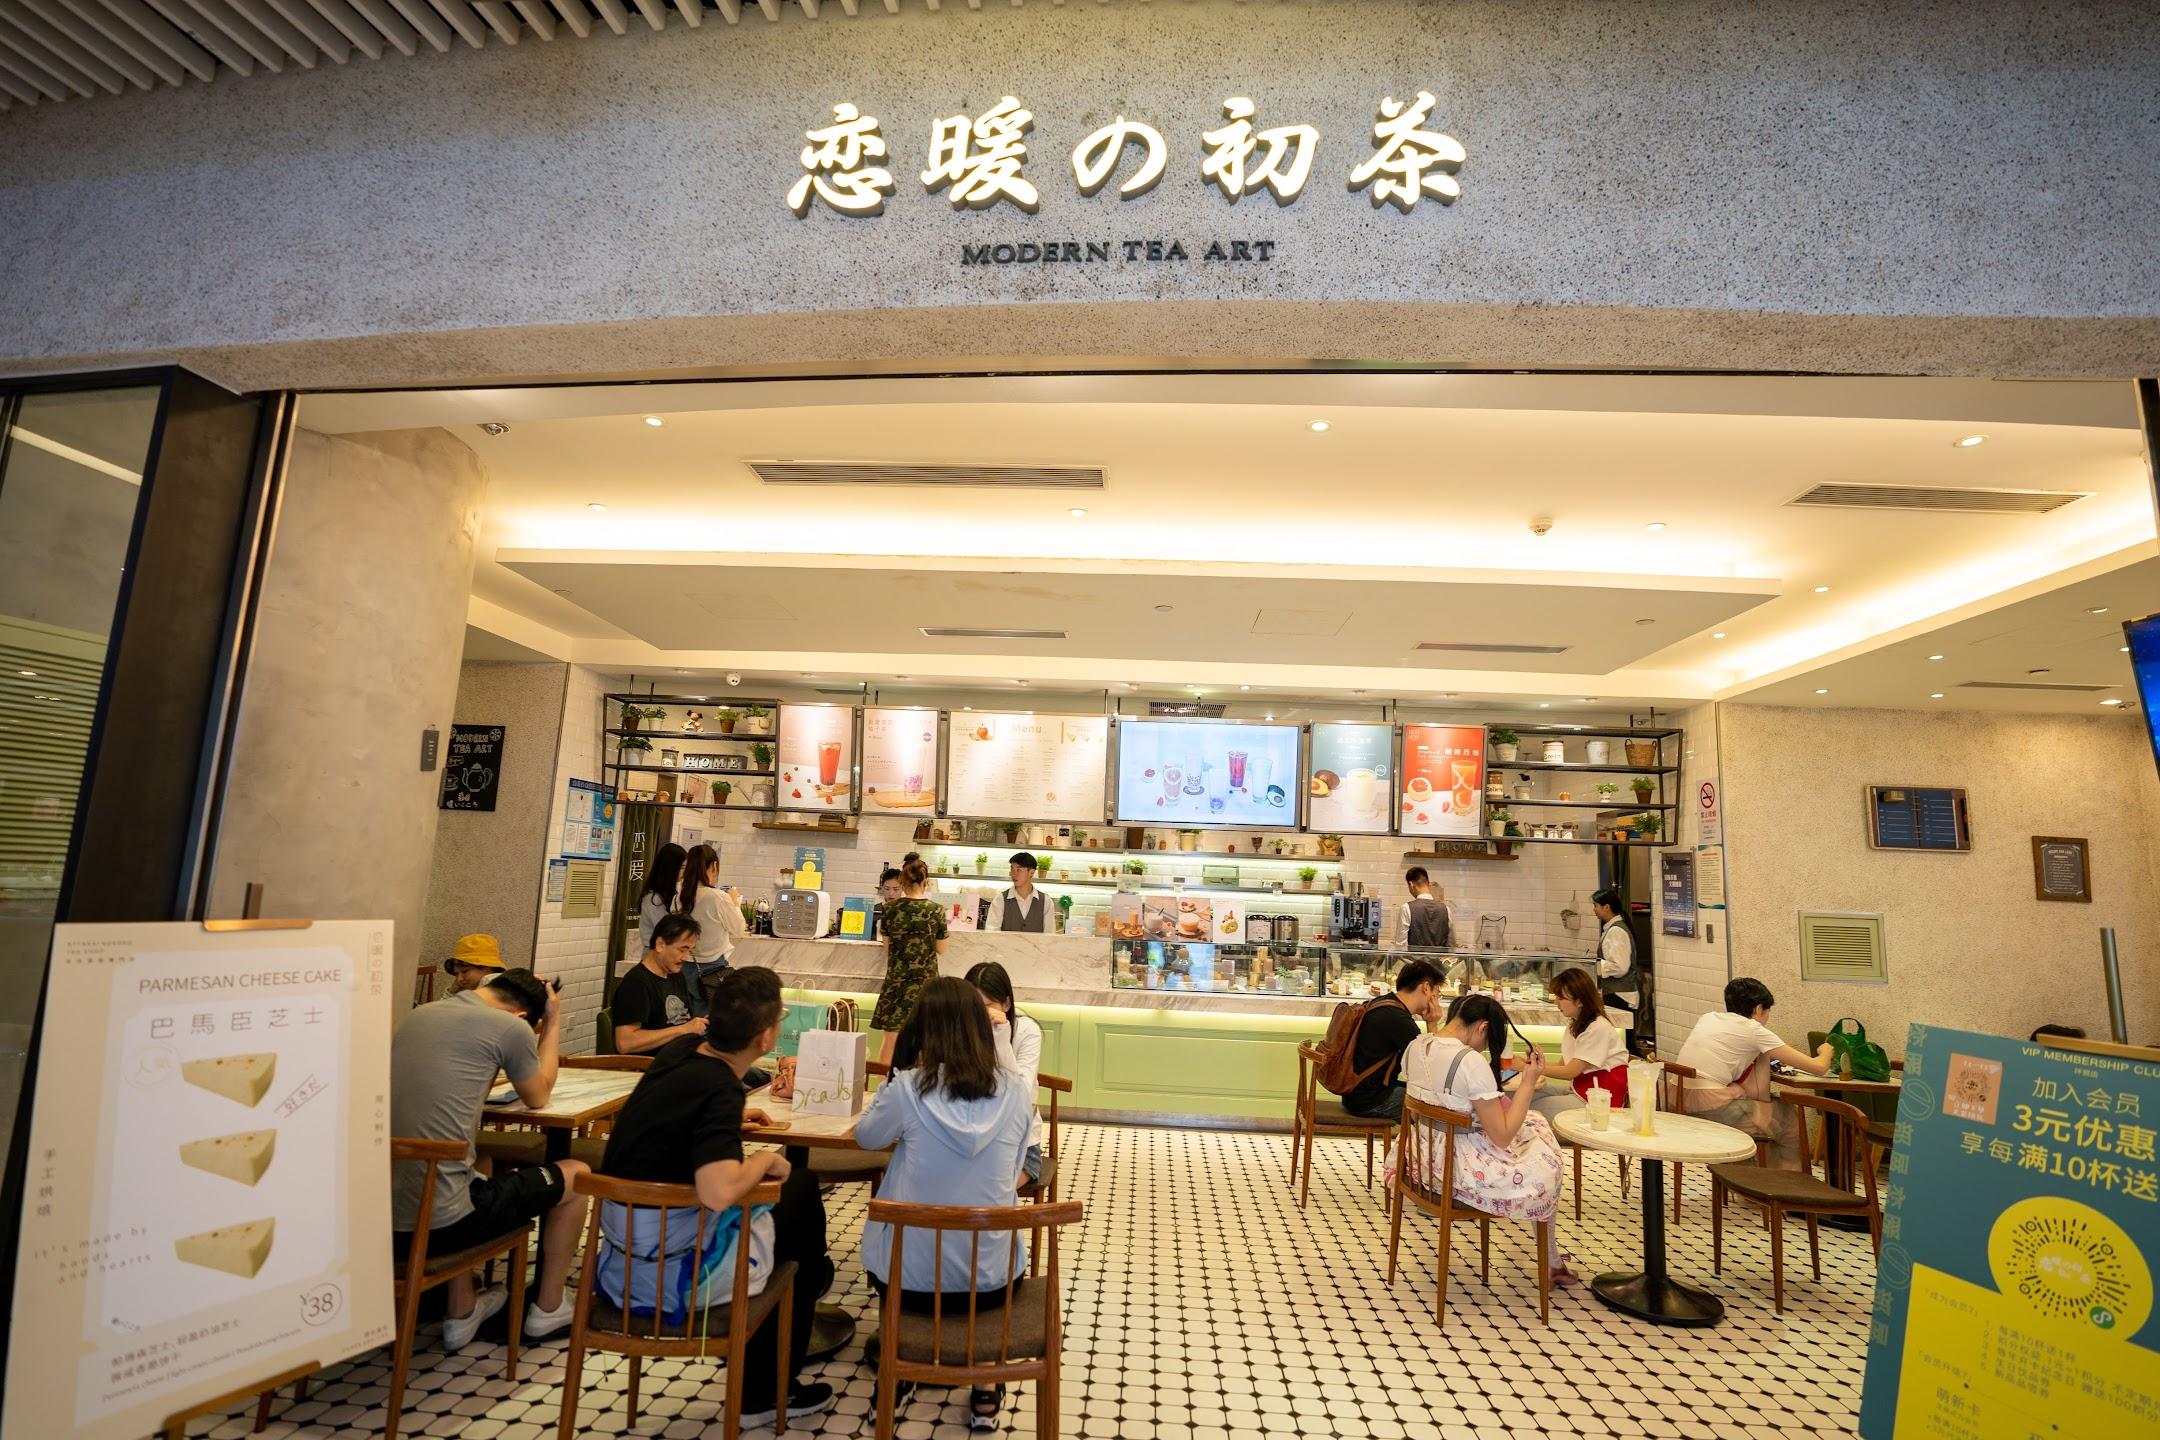 上海 恋暖の初茶(Modern Tea Art)1